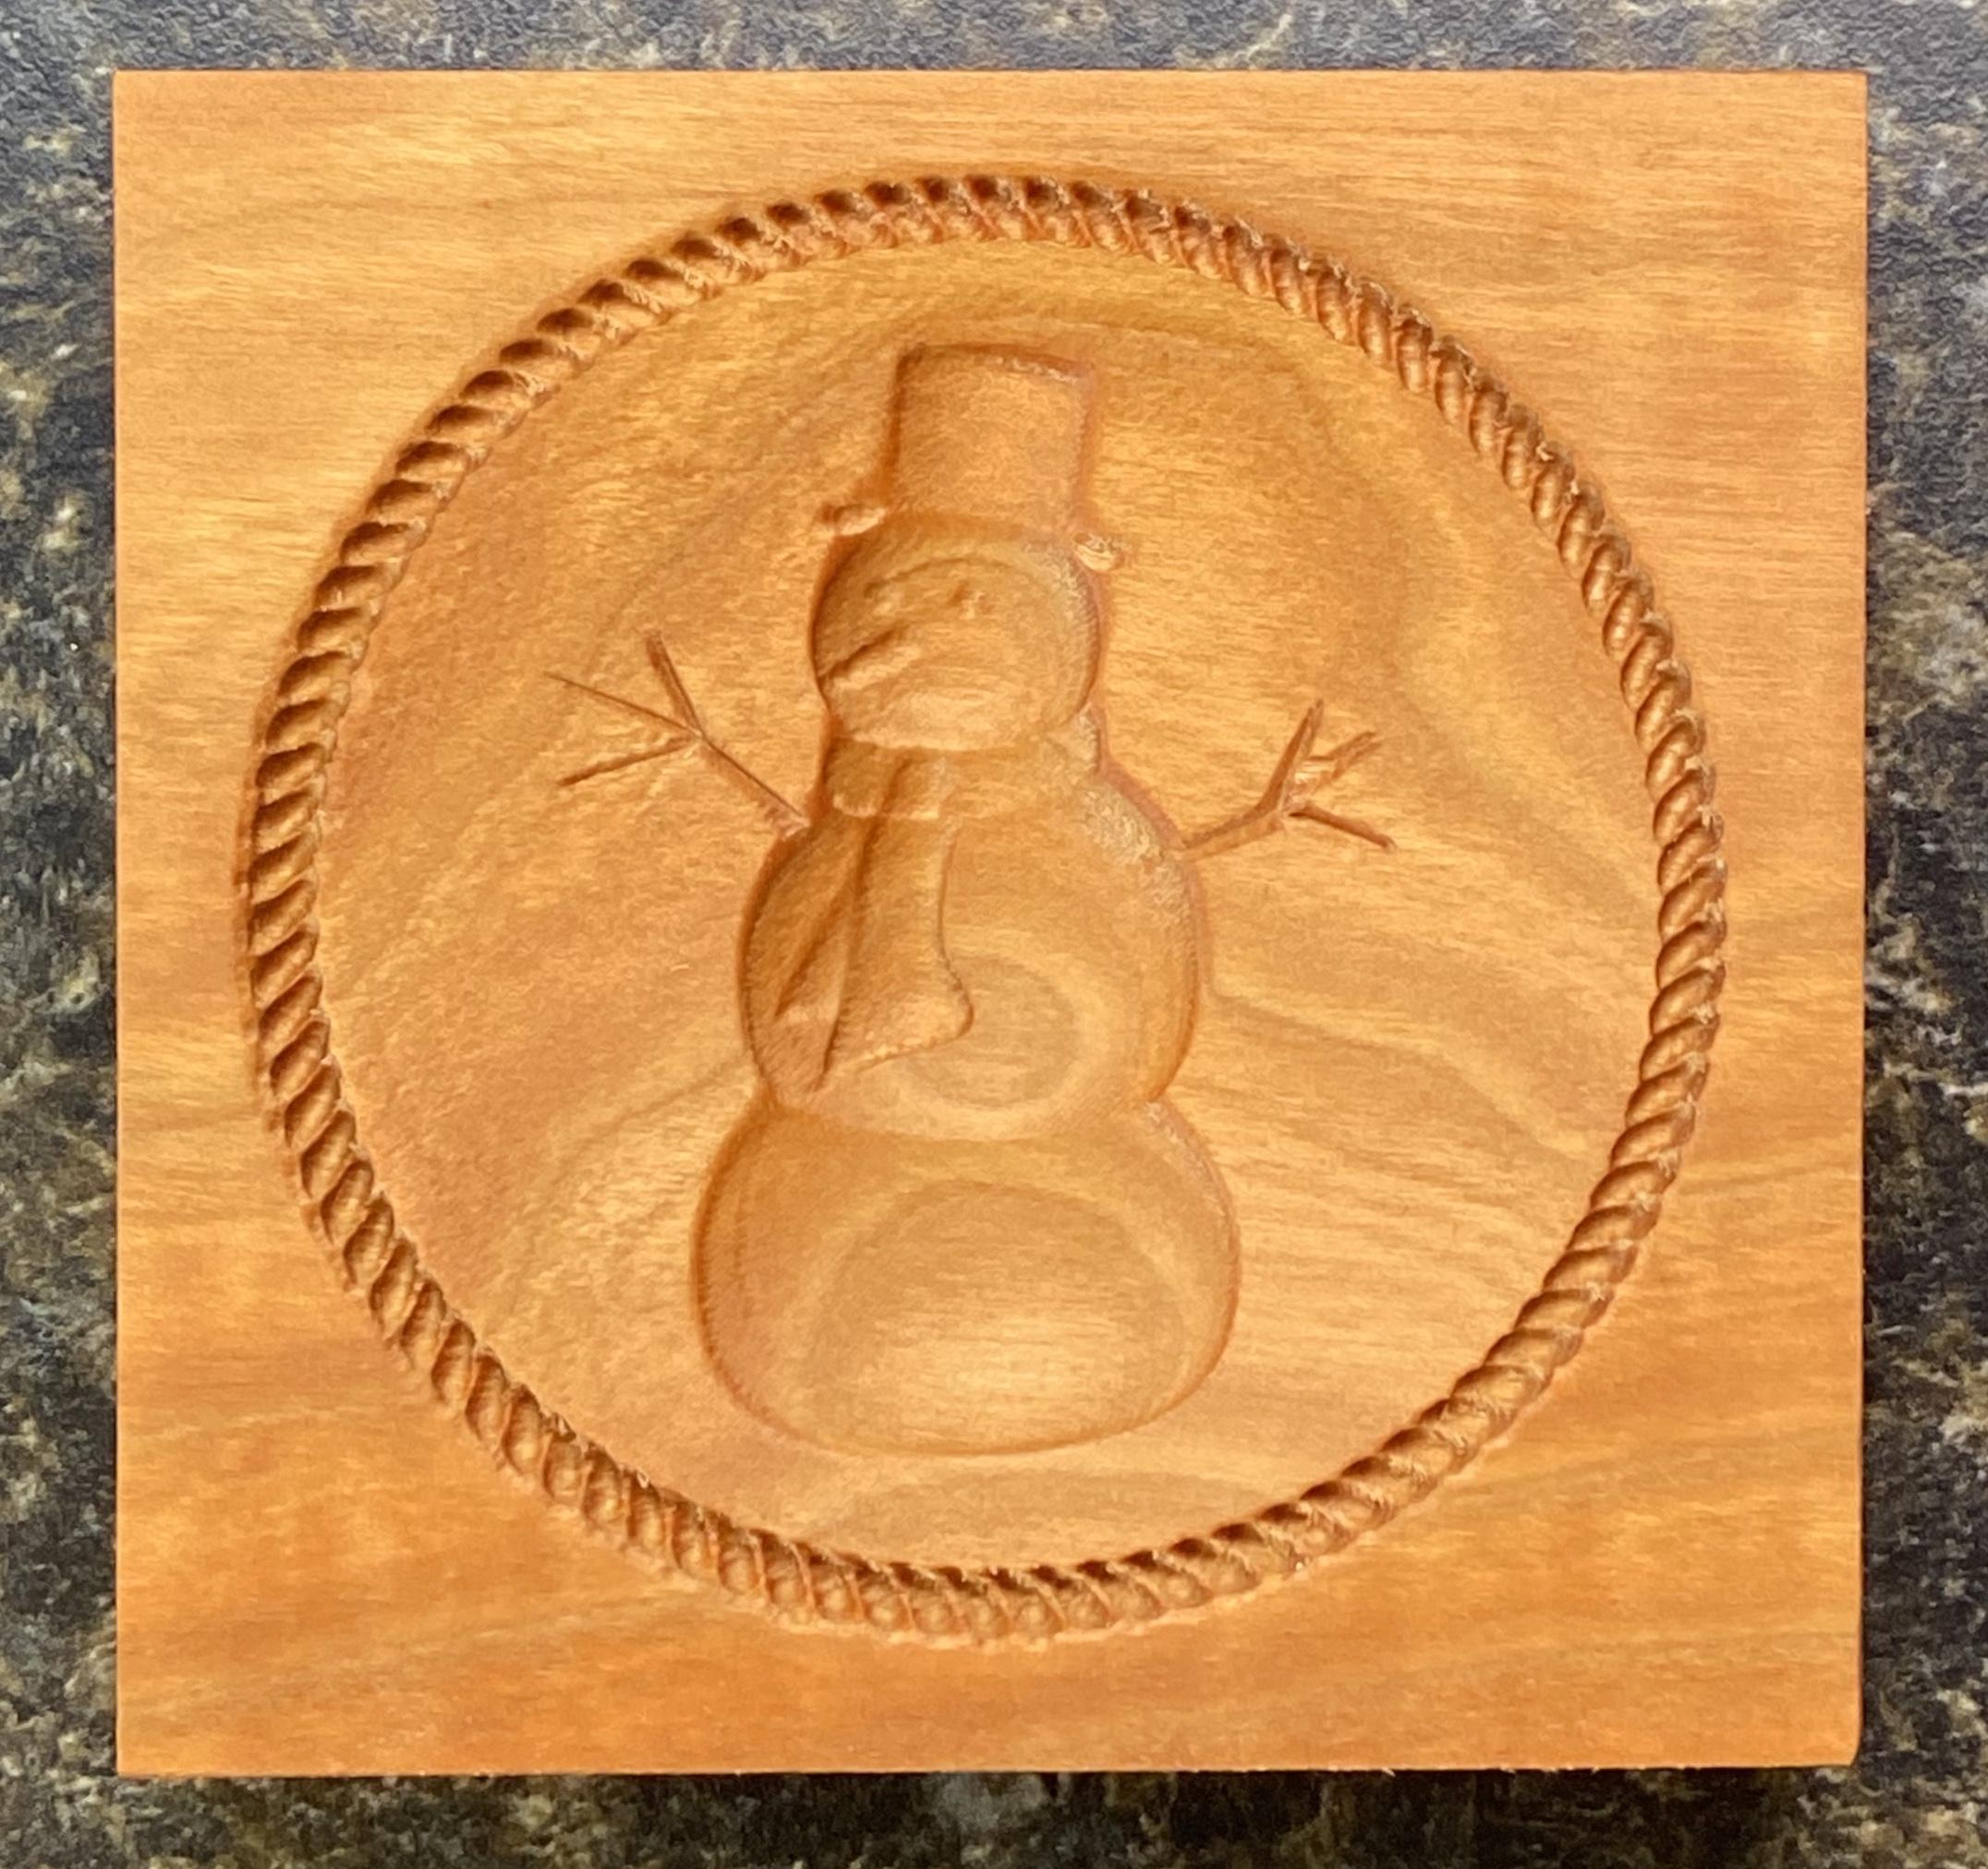 Springerle Cookie Mold - Snowman